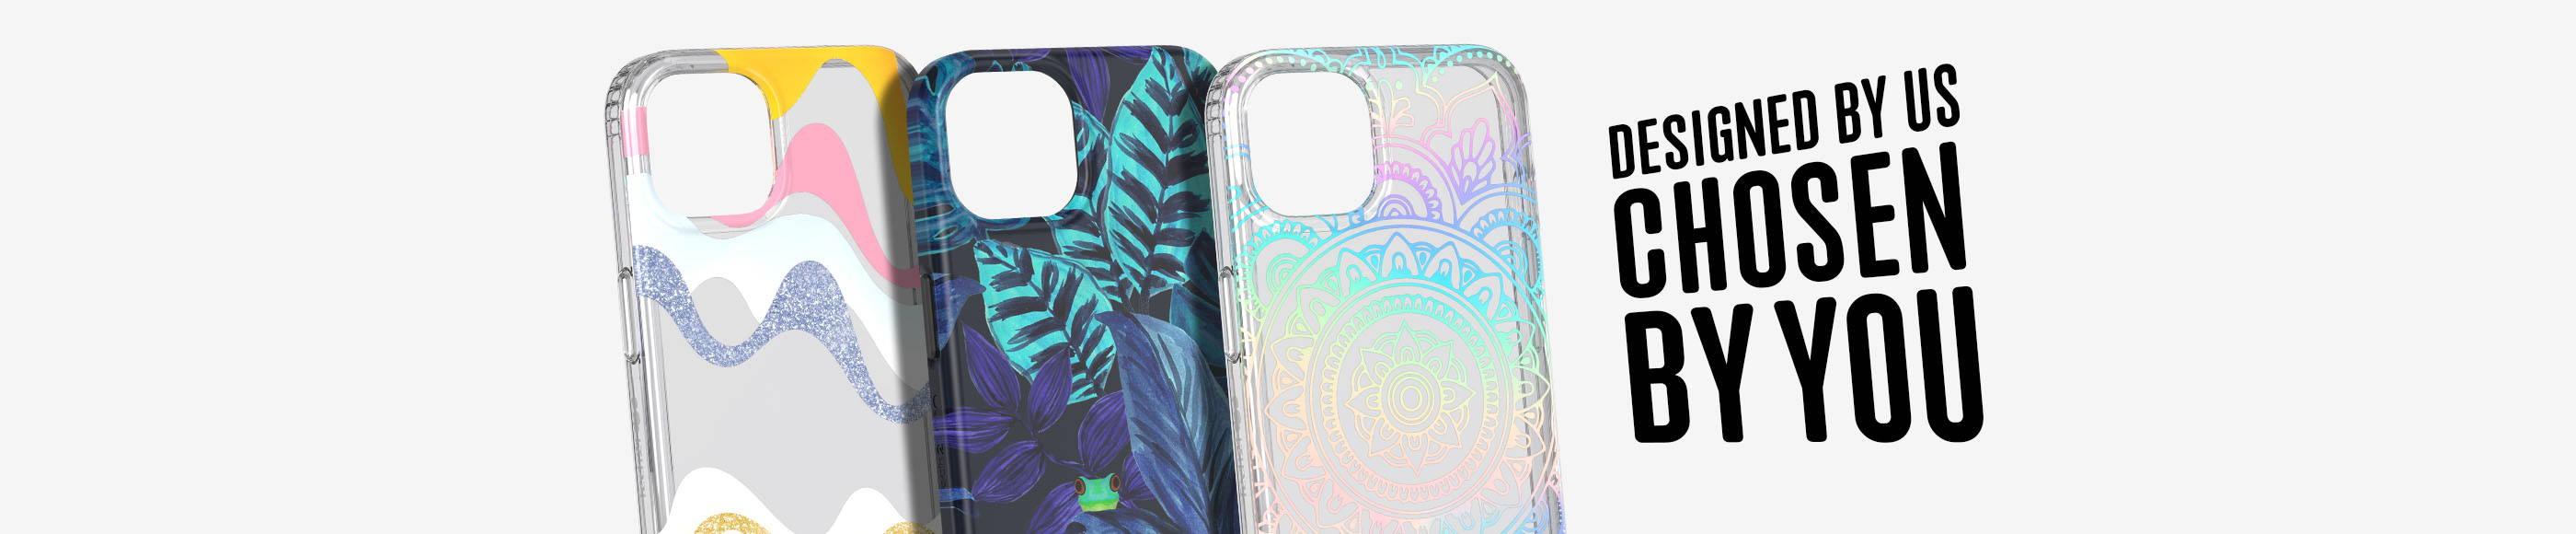 Tech21 Evo Art Wiggle Mandala iPhone 13 cases and Eco Art iPhone 13 Frog case